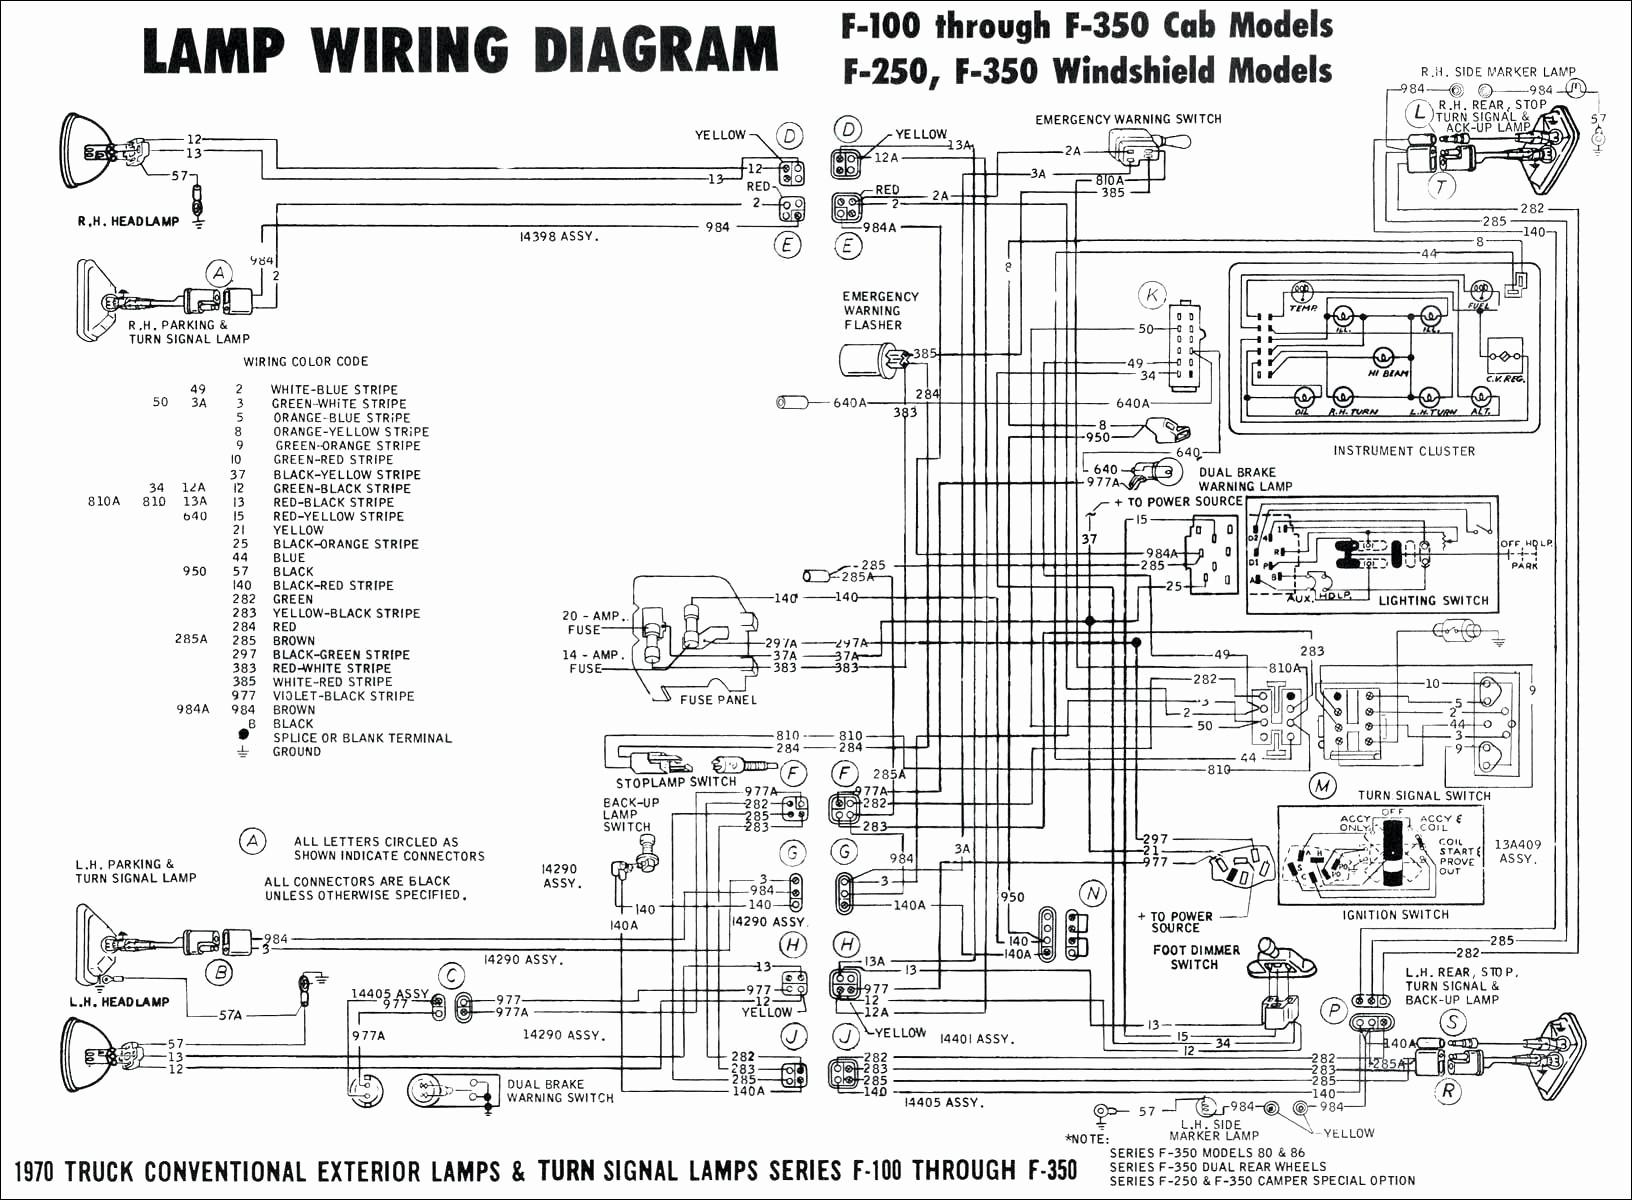 [SCHEMATICS_48ZD]  HO_9204] Rzt Cub Cadet Wiring Diagram Download Diagram | Cub Schematic Cadet Rzt42electrical |  | Flui Itis Wida Scoba Bocep Mohammedshrine Librar Wiring 101